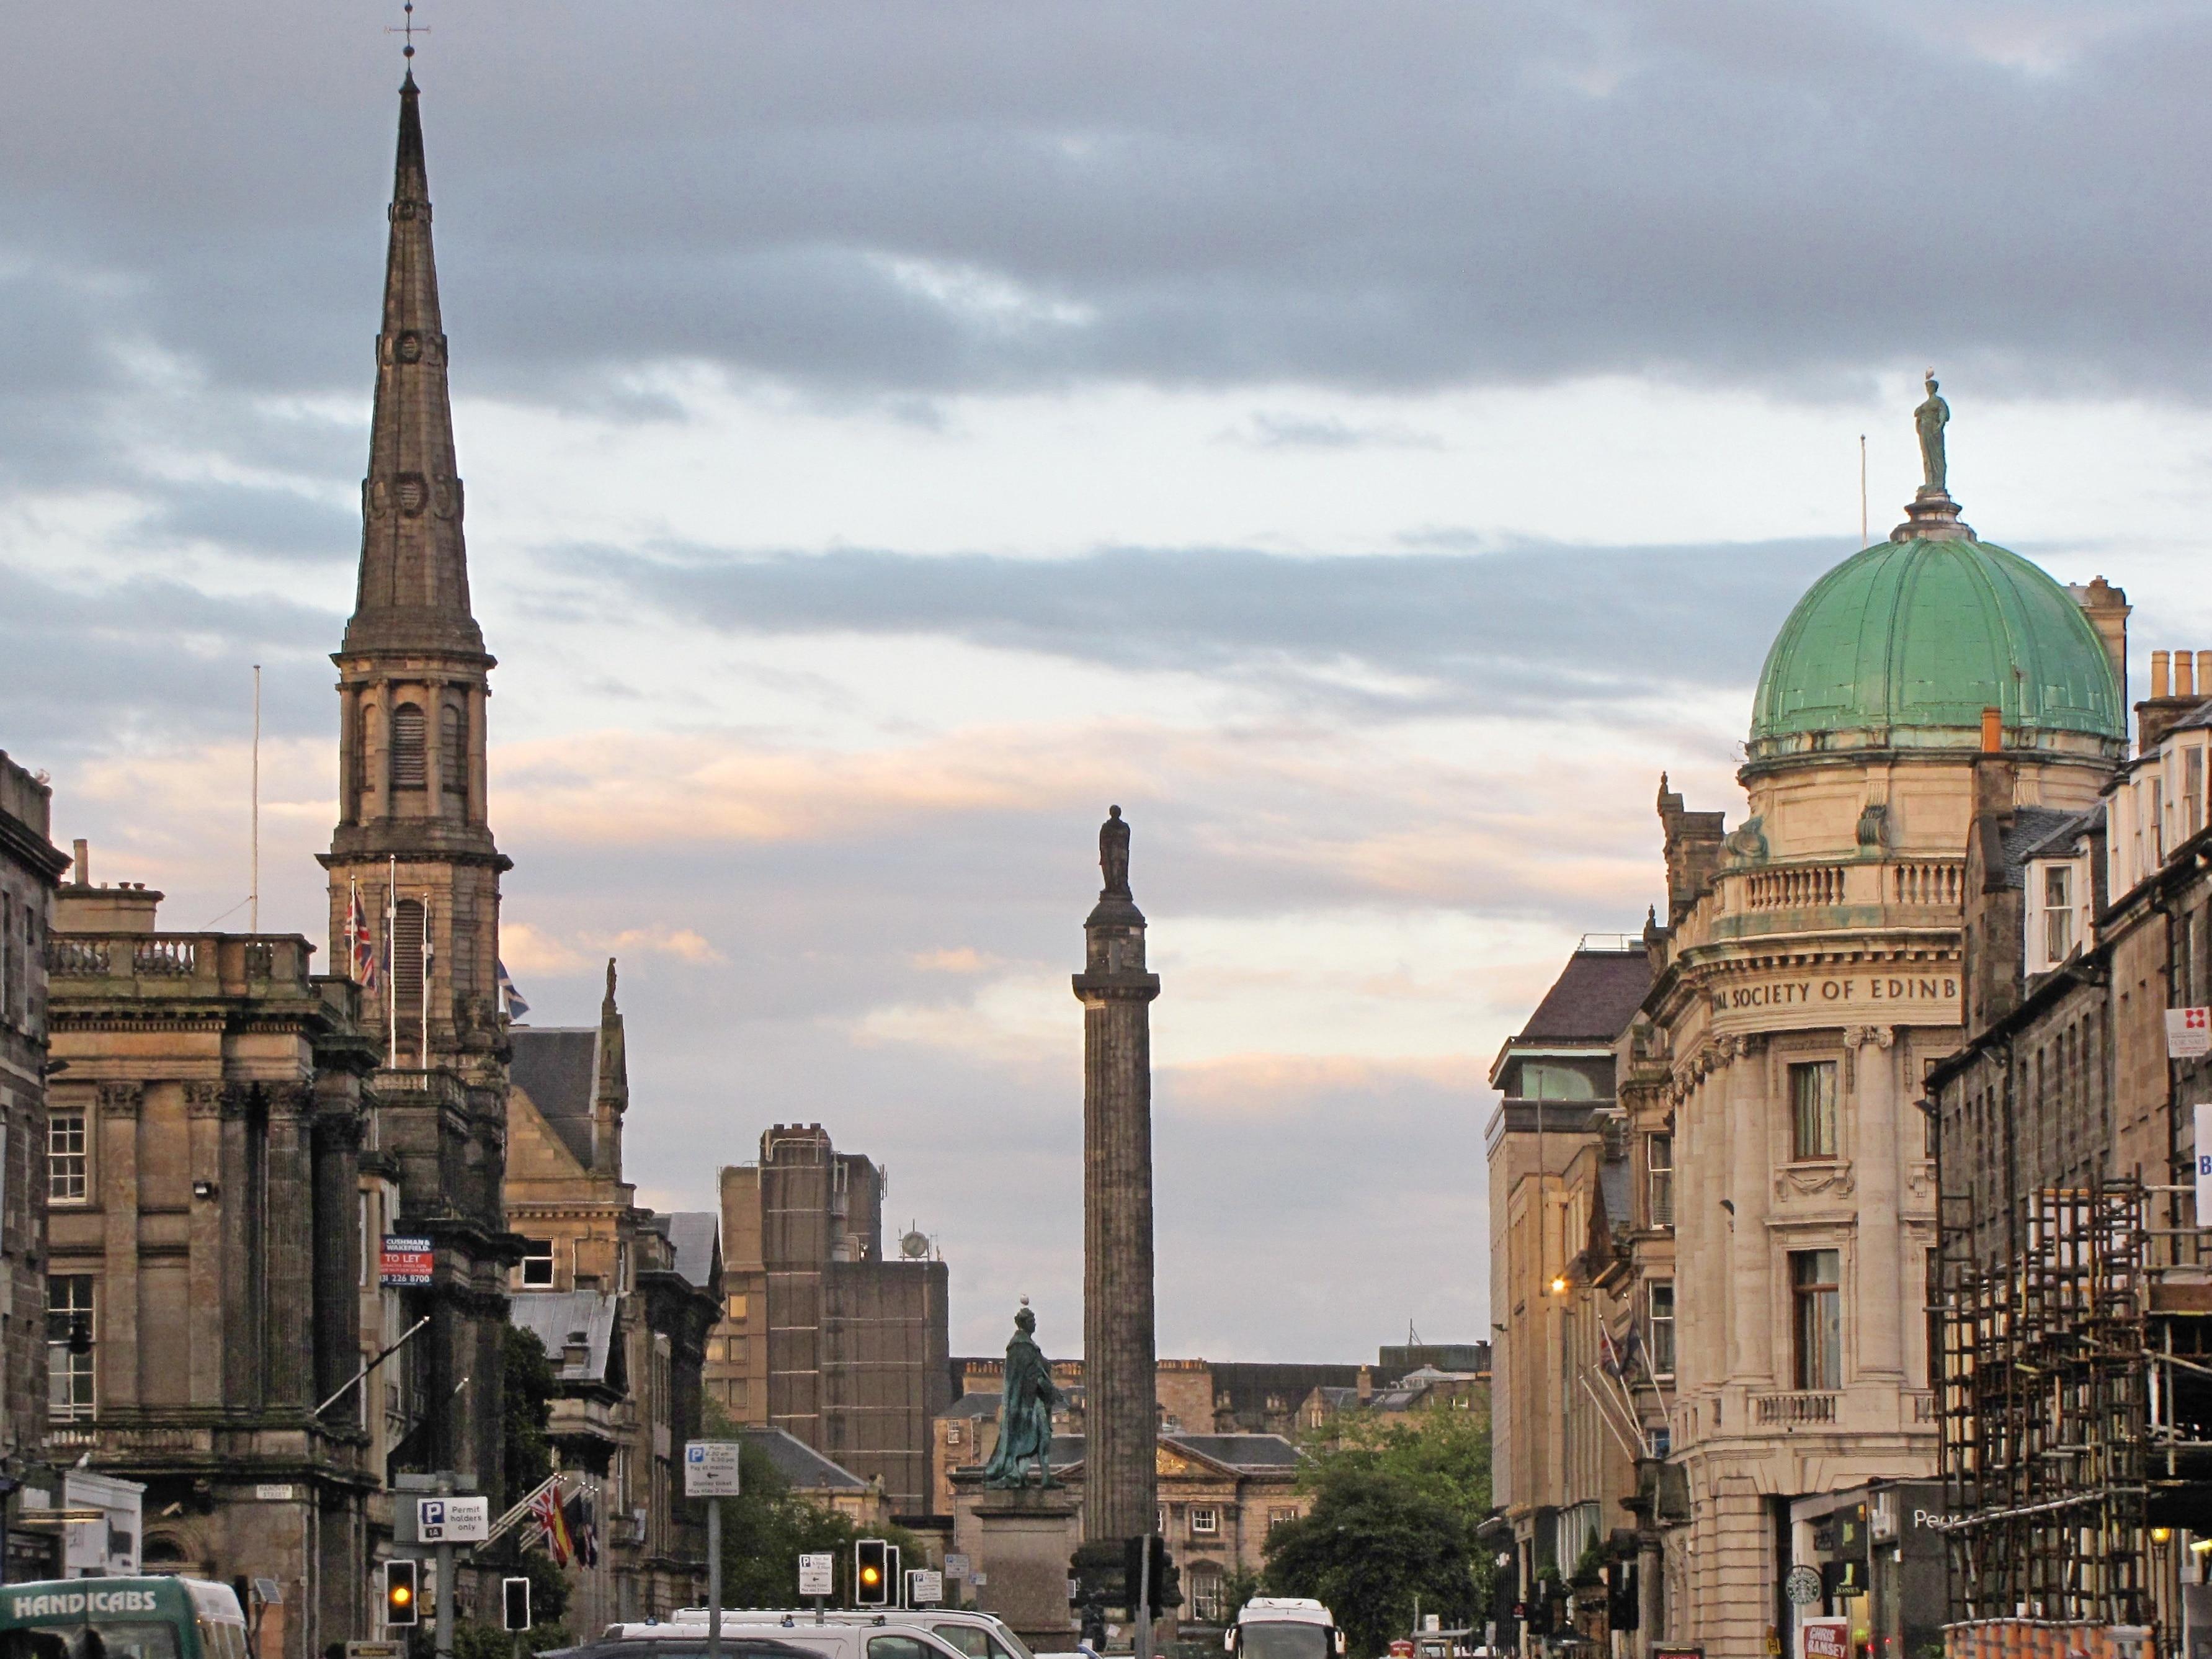 George Street, Edinburgh, Scotland, United Kingdom